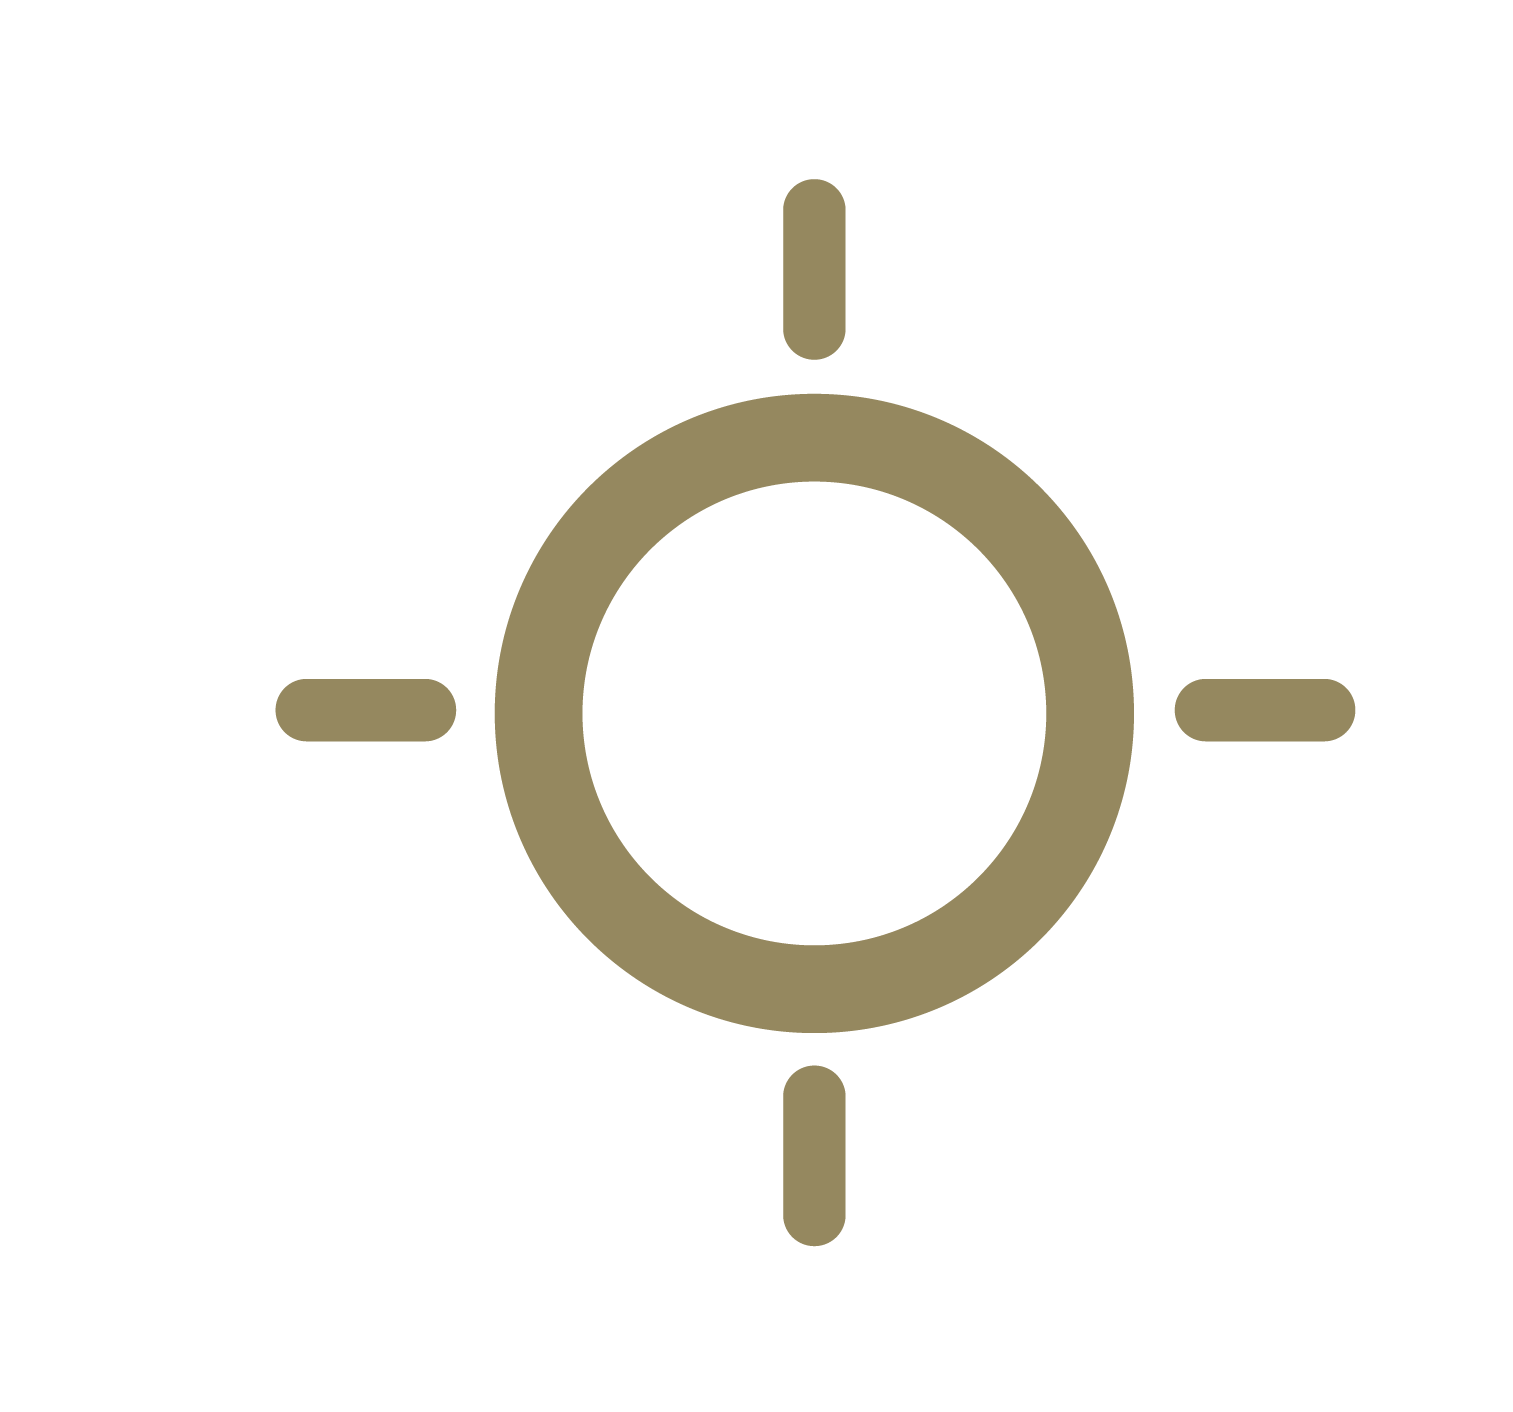 agence-écho—agence-de-communication-05